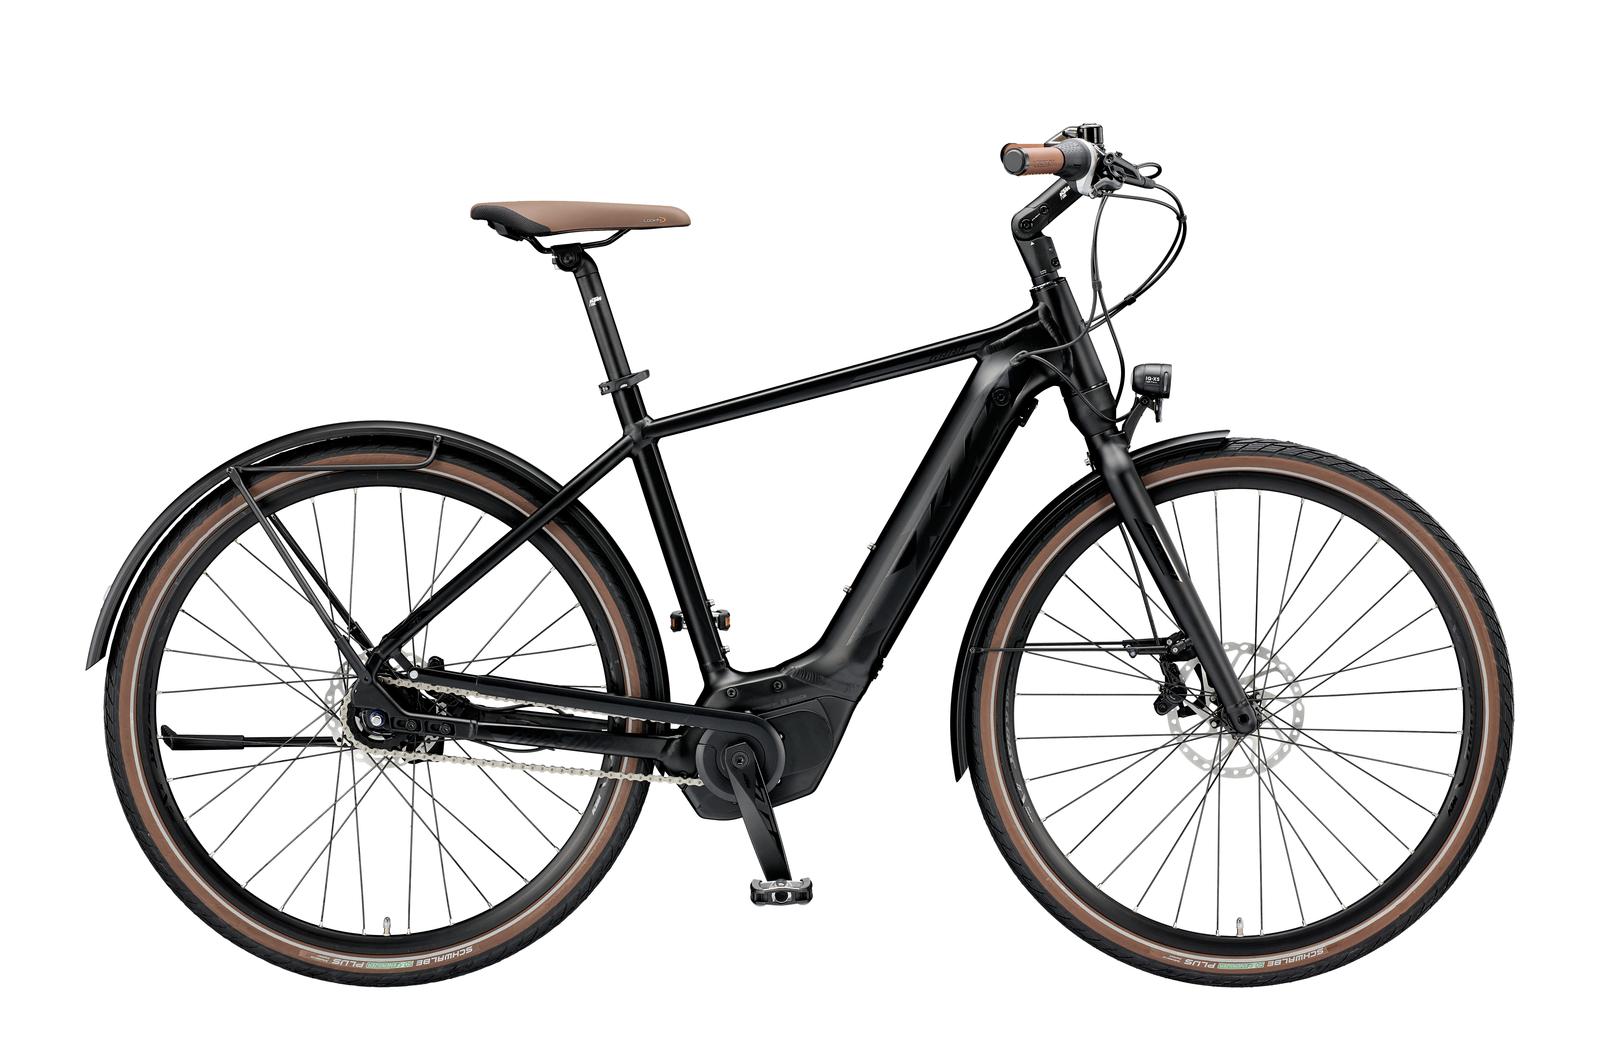 e bike geheimtipp ktm macina gran 5 p5 modell 2019. Black Bedroom Furniture Sets. Home Design Ideas